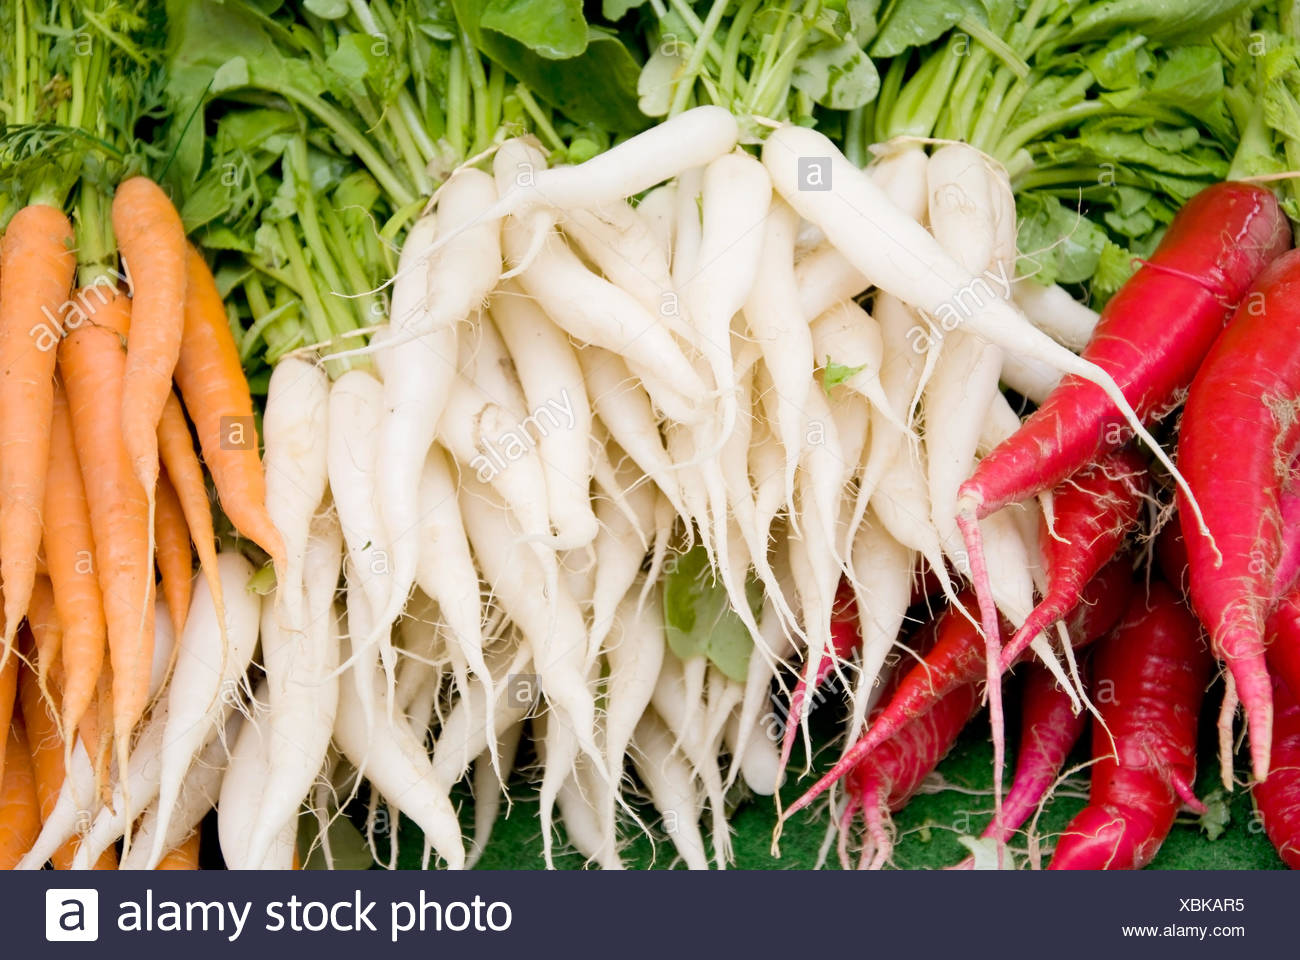 radish carrots - Stock Image